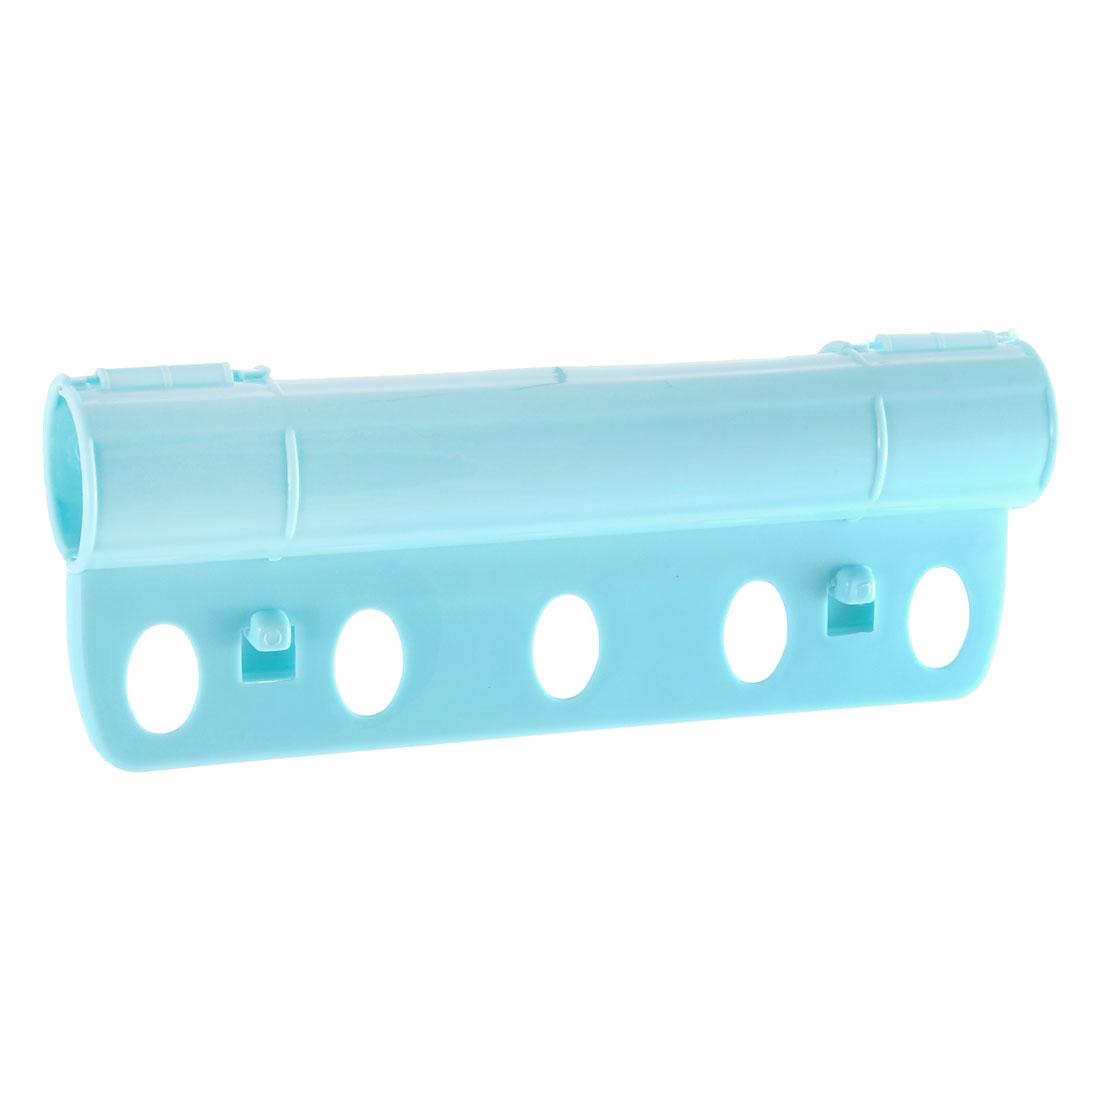 Home 5 Holes Plastic Foldable Rack Bar Fixed Windproof Clothes Hanger Lock Blue